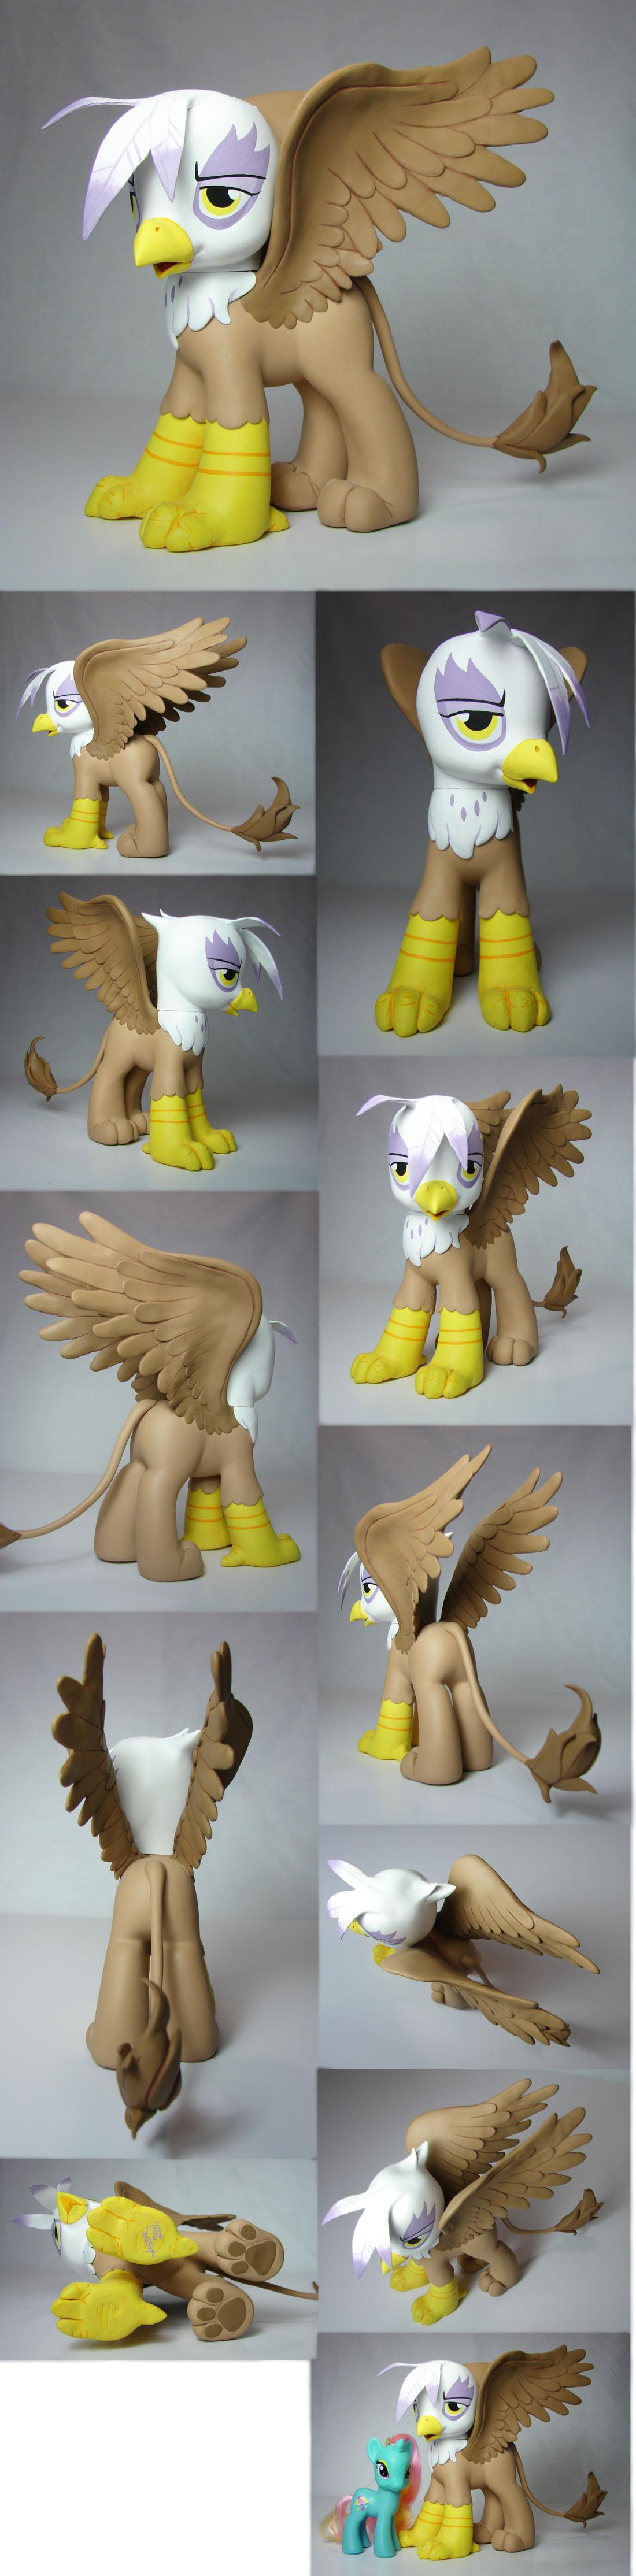 Gilda the Griffon my little pony FIM custom by Woosie